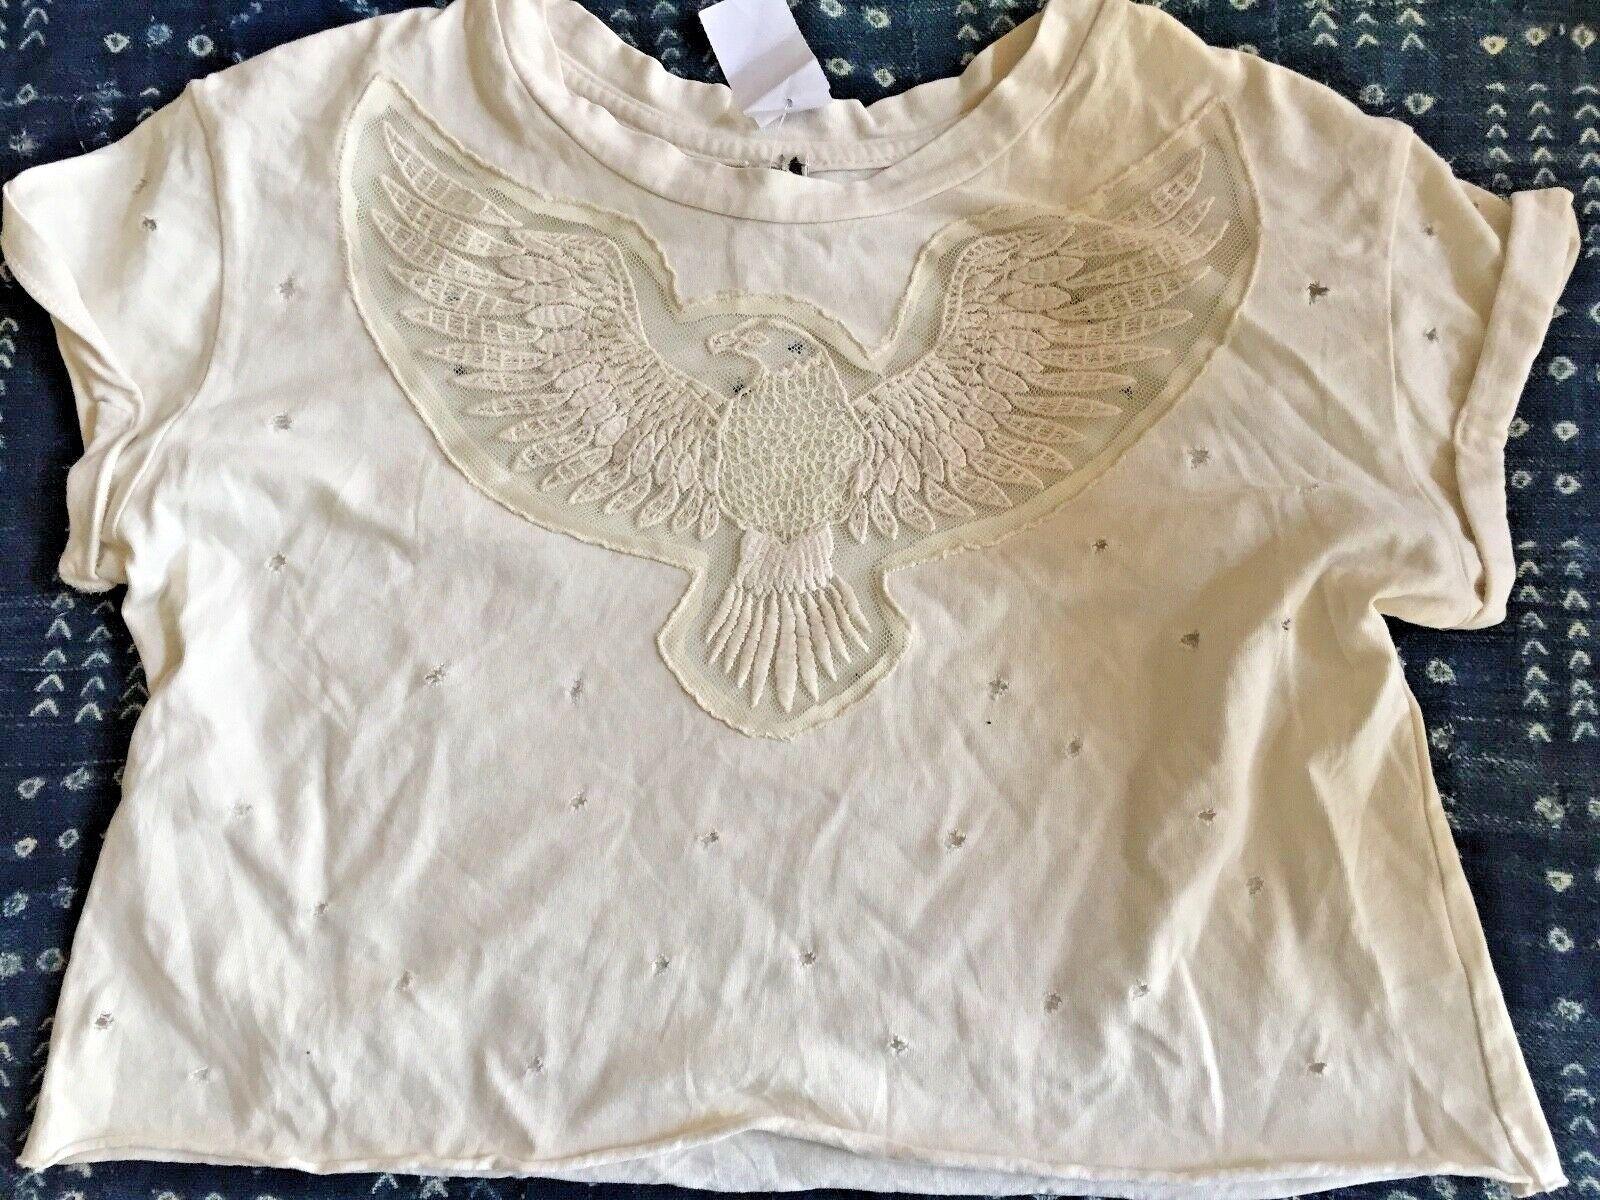 Emma & Sam Cropped T-Shirt, LF Store, Cream, New, Eagle Lace Applique,  XS